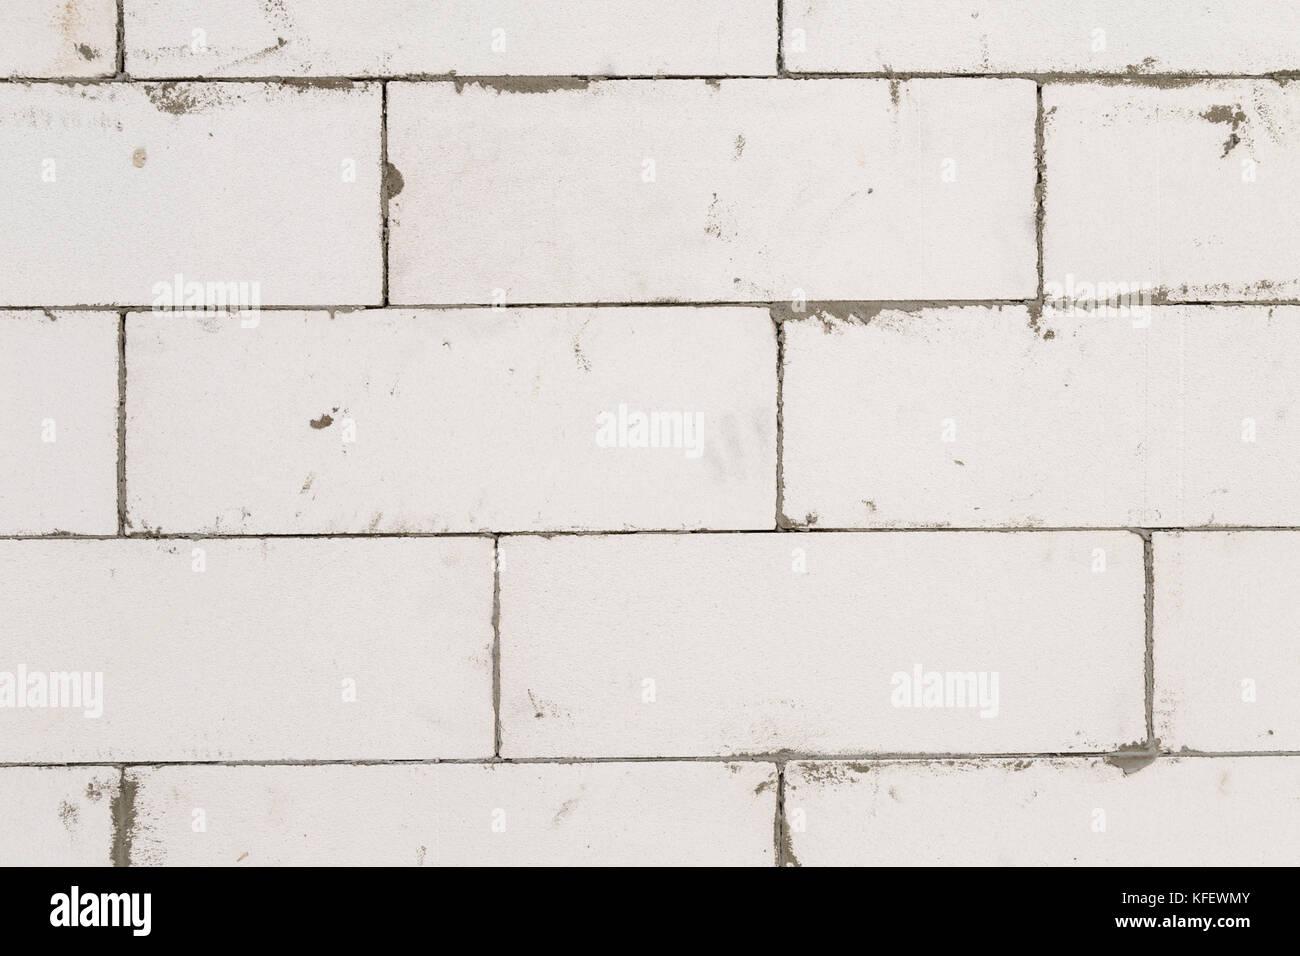 Masonry walls of aerated concrete 47